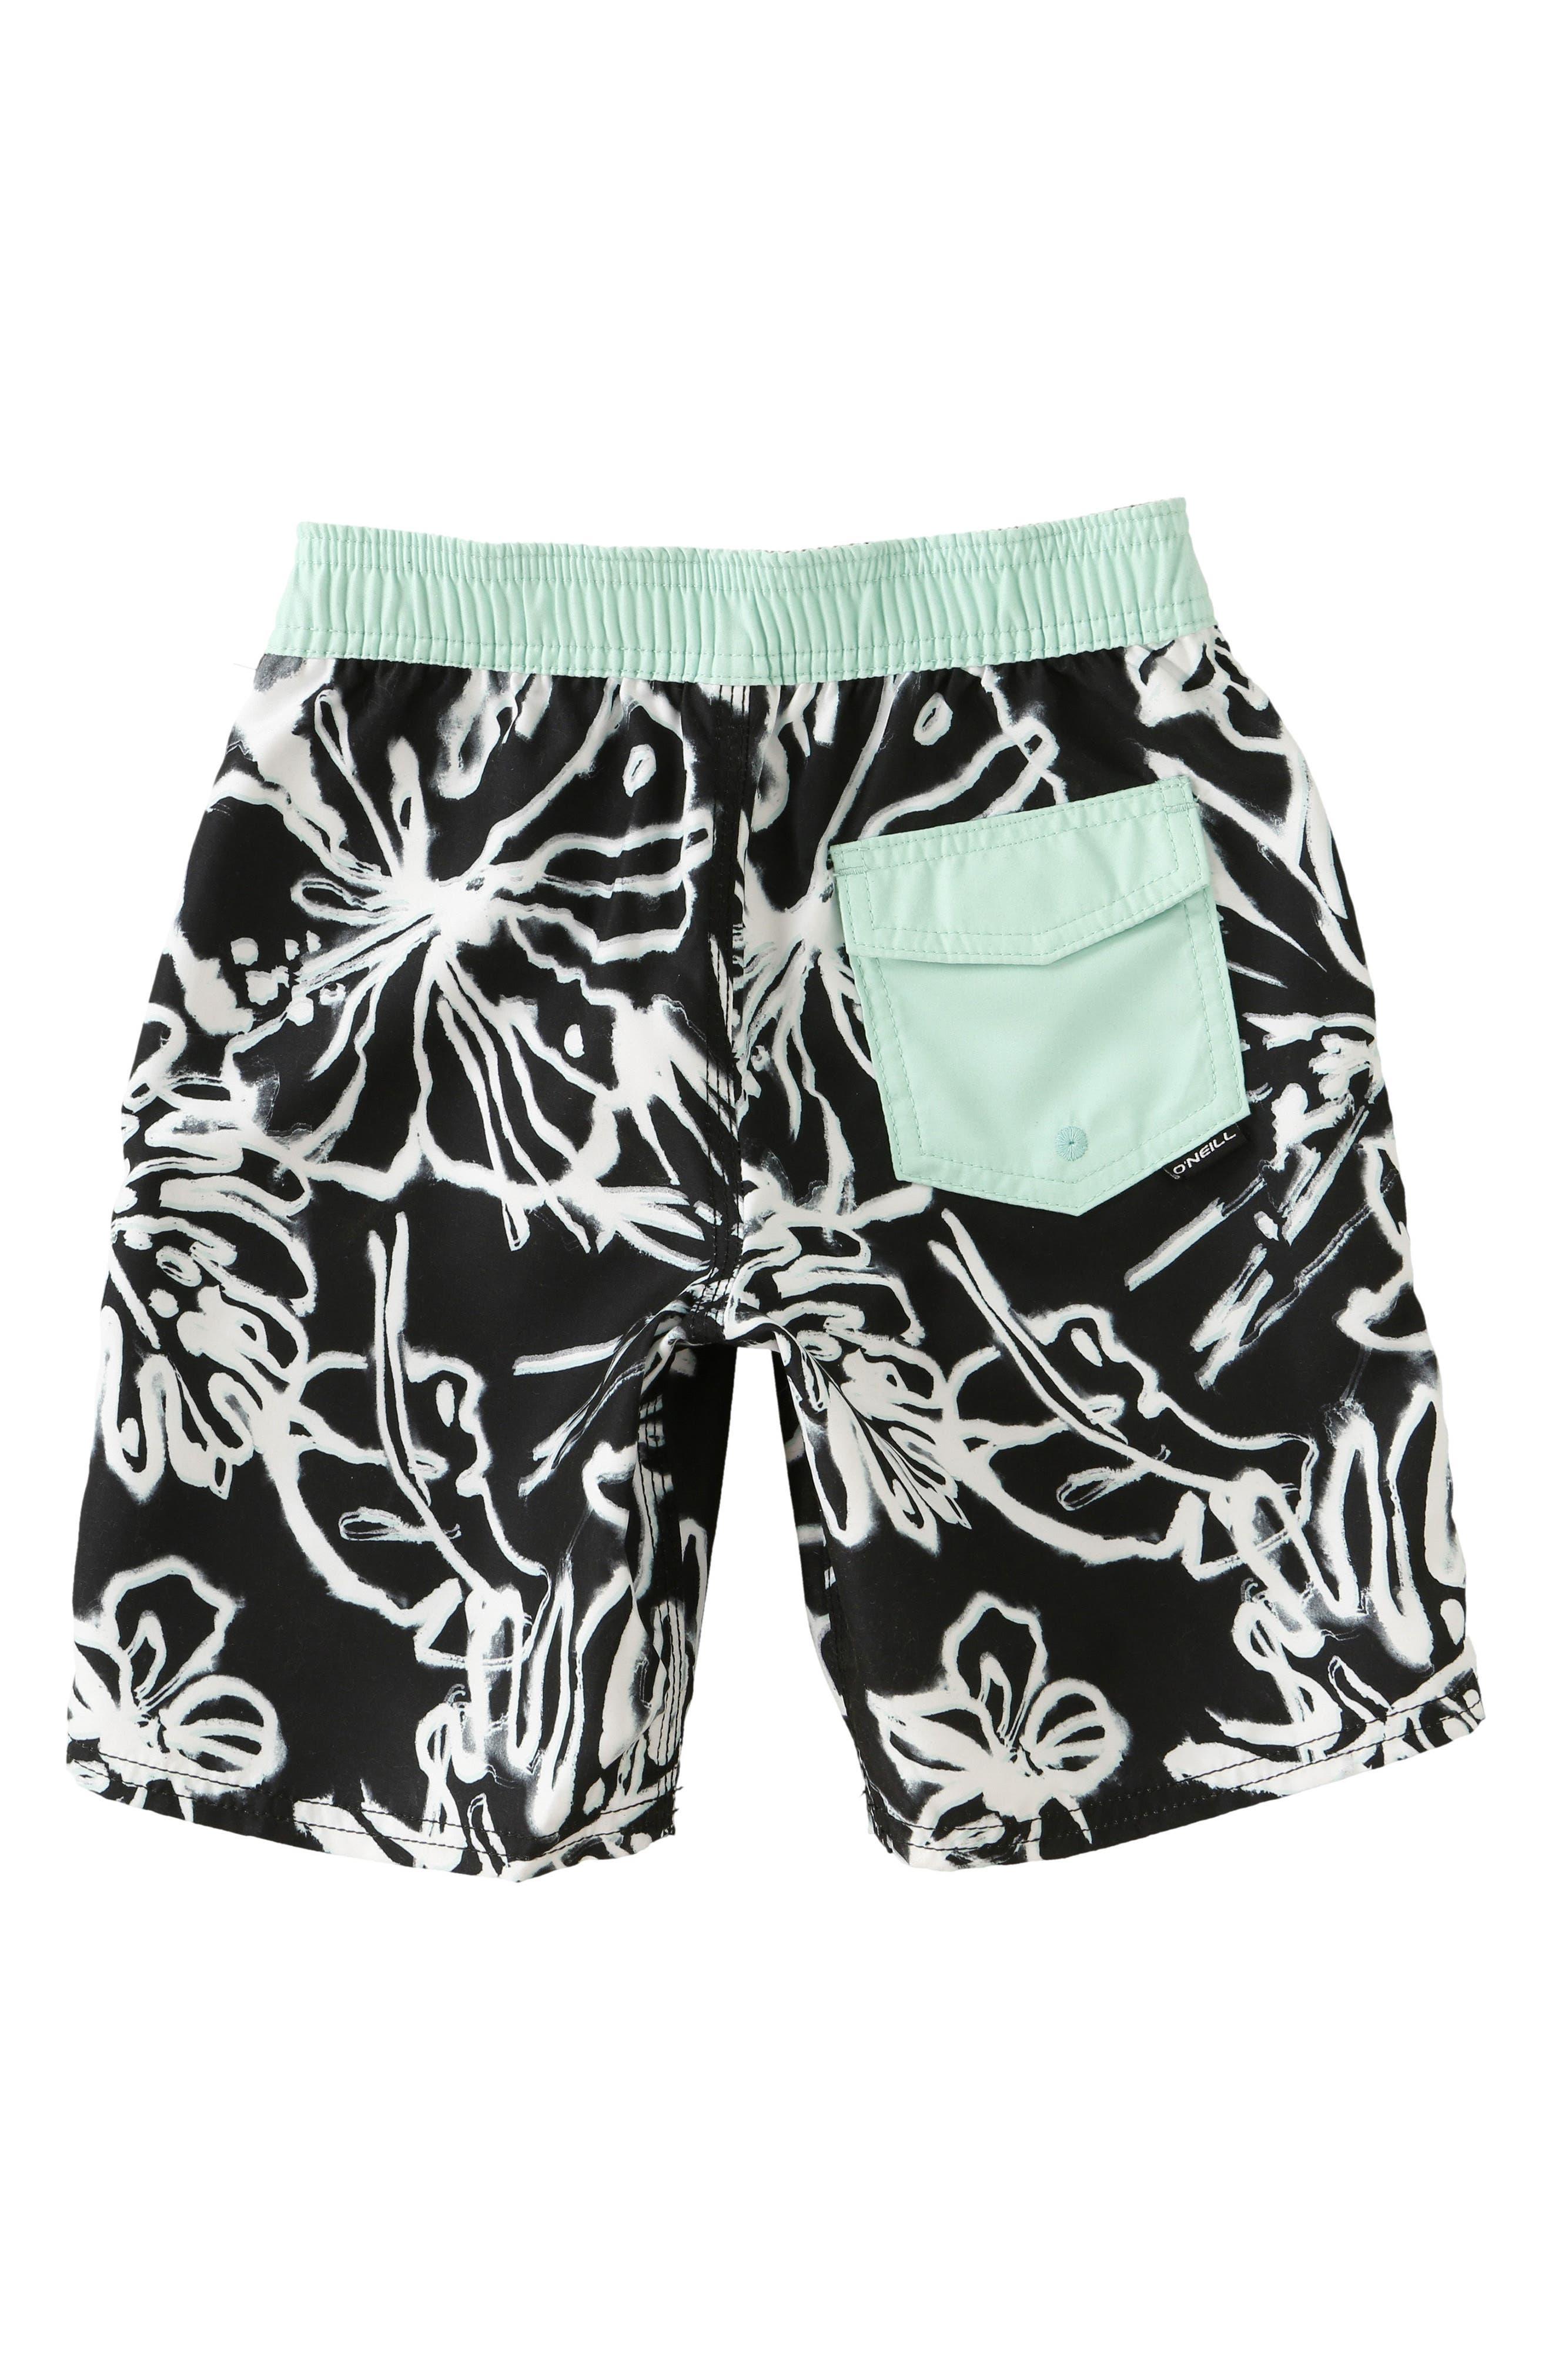 Hanalei Board Shorts,                             Alternate thumbnail 2, color,                             Black